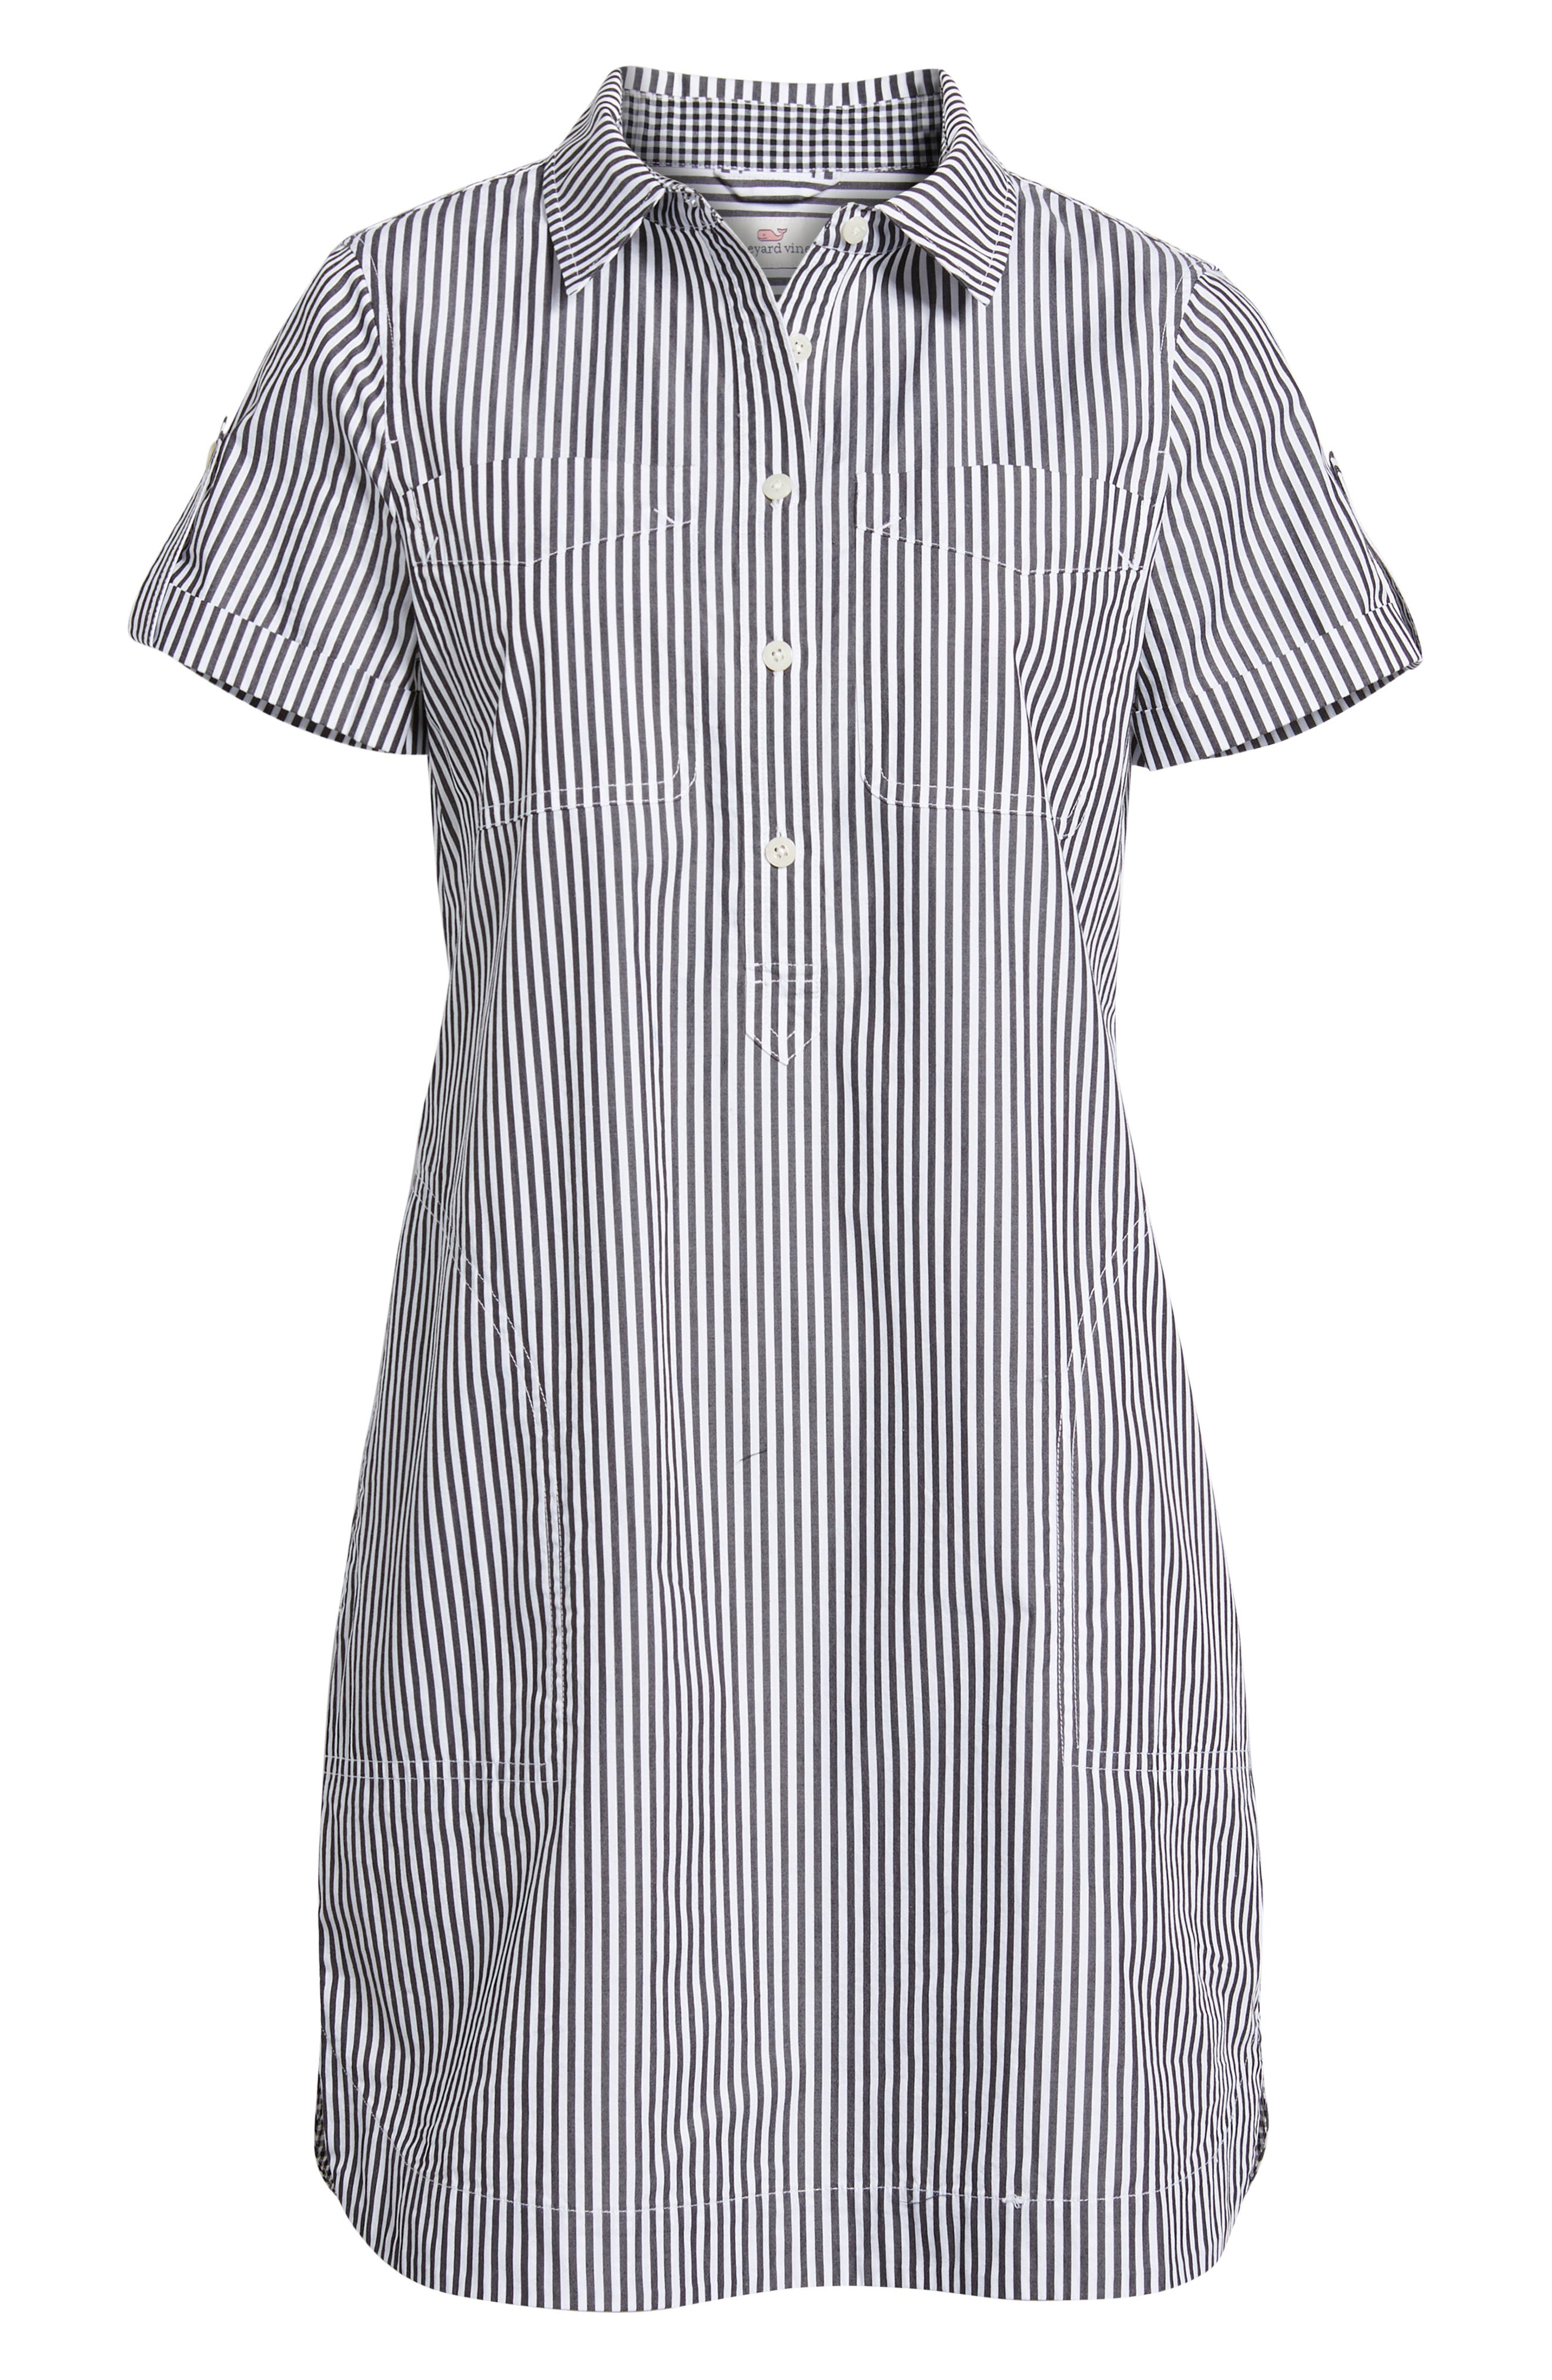 Stripe Utility Shirtdress,                             Alternate thumbnail 7, color,                             002